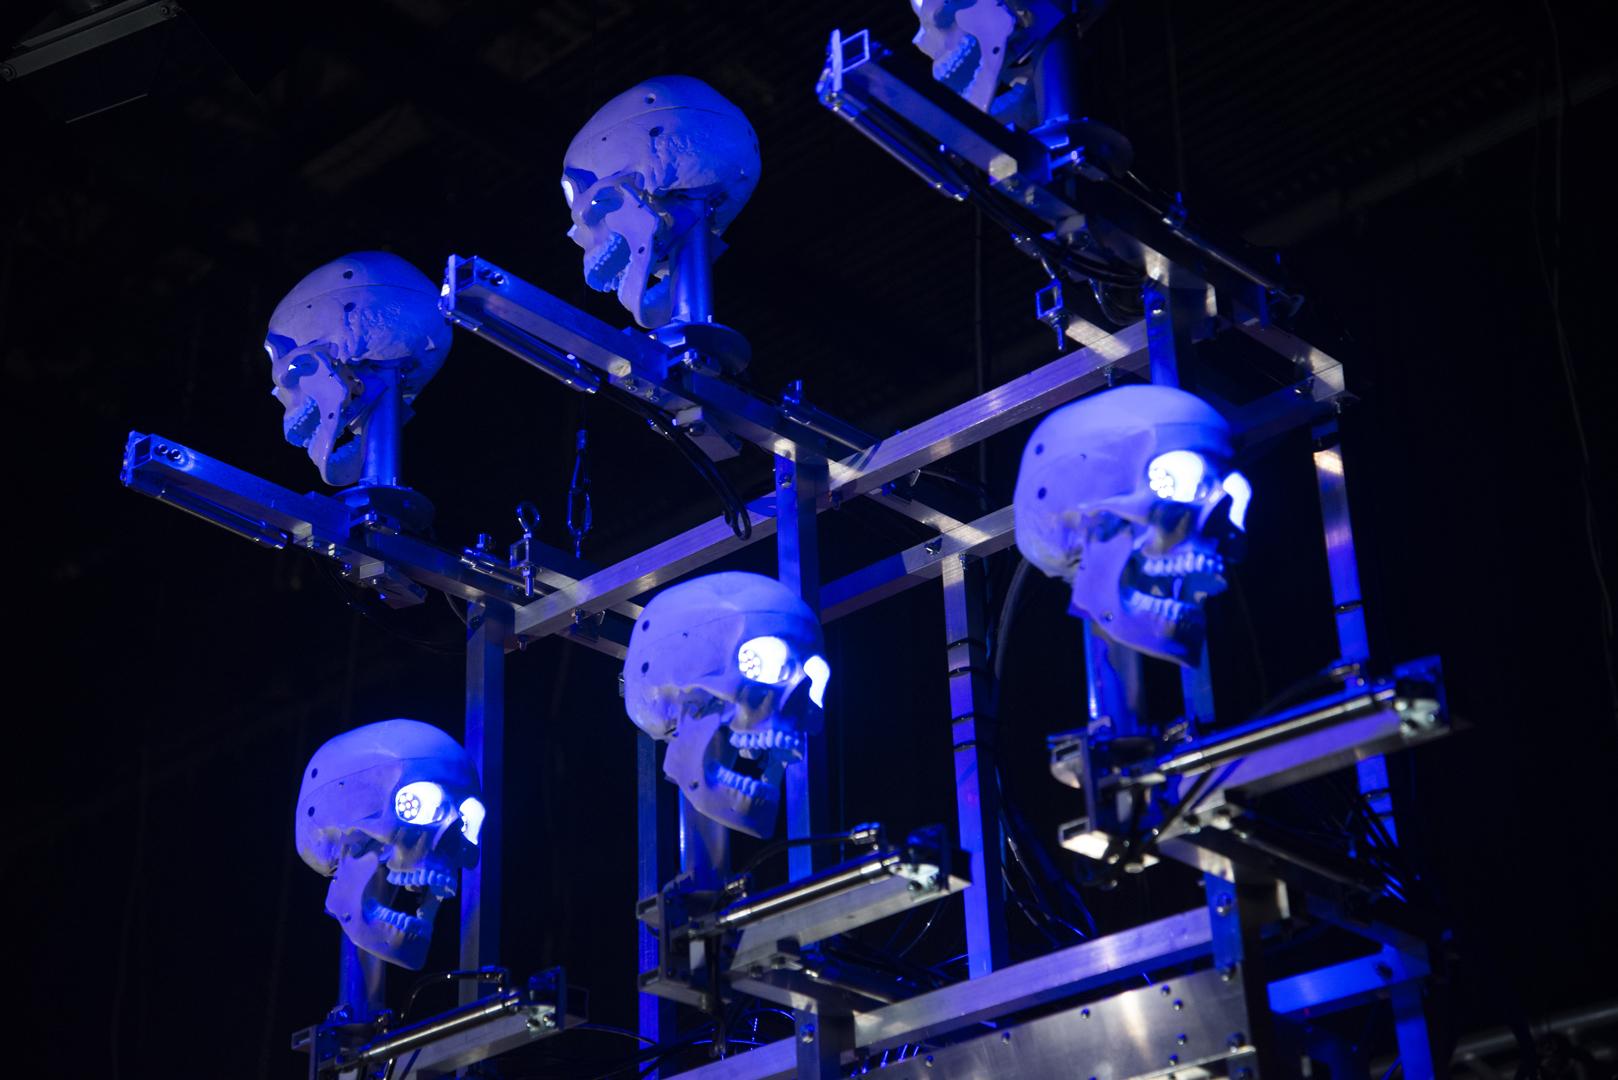 ©ISEA2019: 25th International Symposium on Electronic Art, Bill Vorn, Embodying Robot Performance